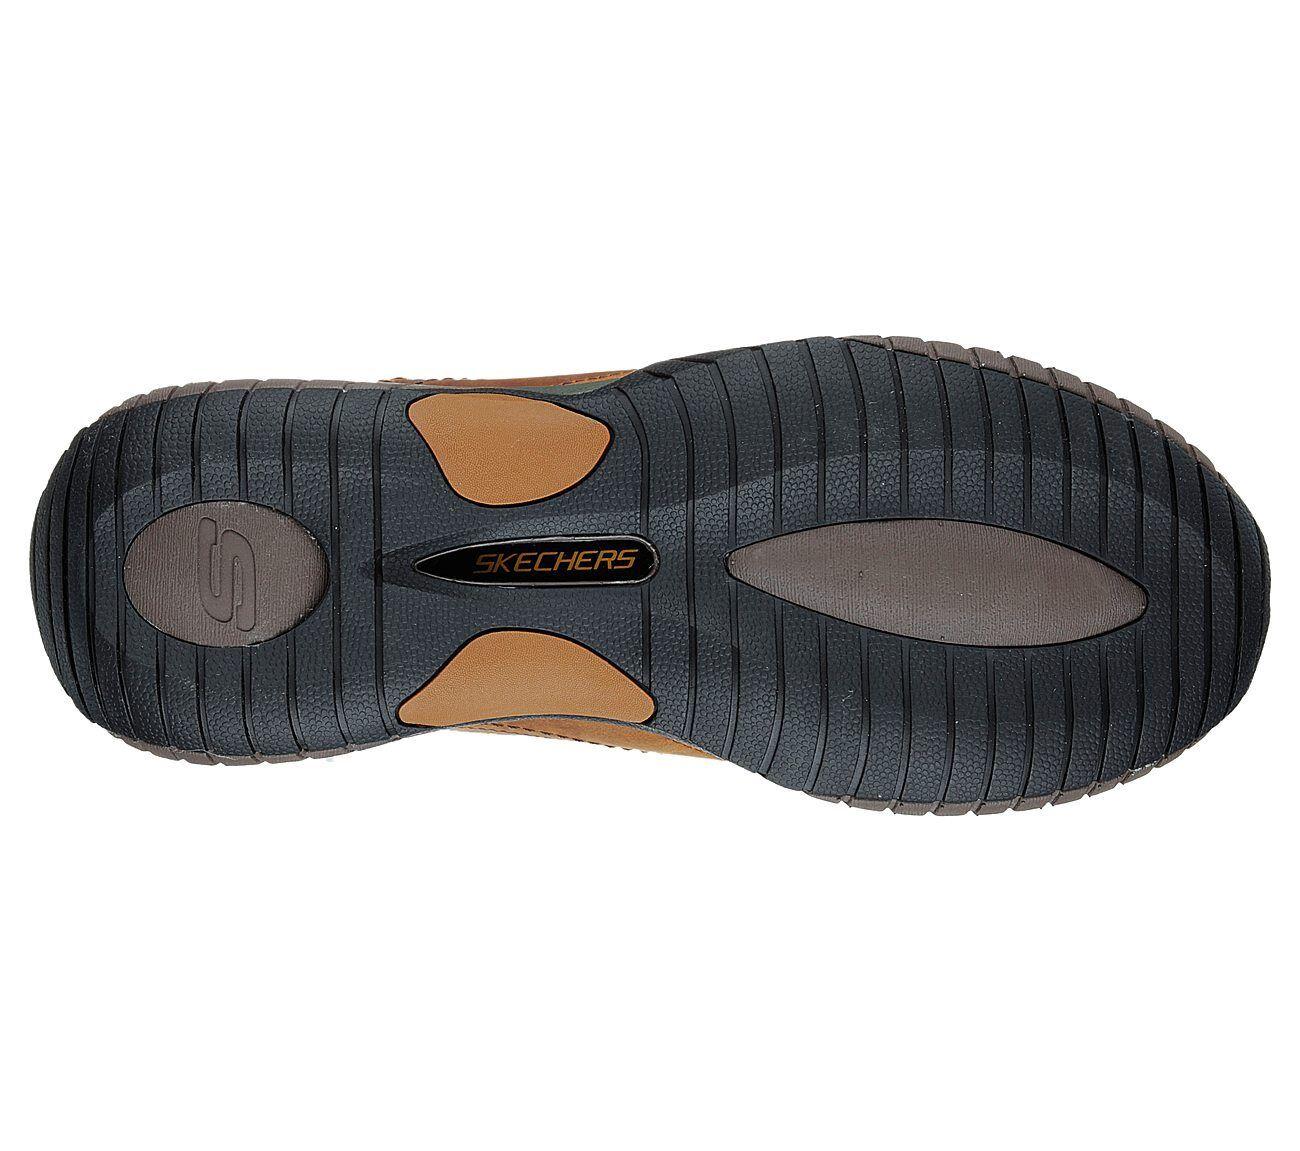 Skechers Foam Sendro Bascom Trainers  Uomo Memory Foam Skechers Slip On Leder Schuhes e39a09